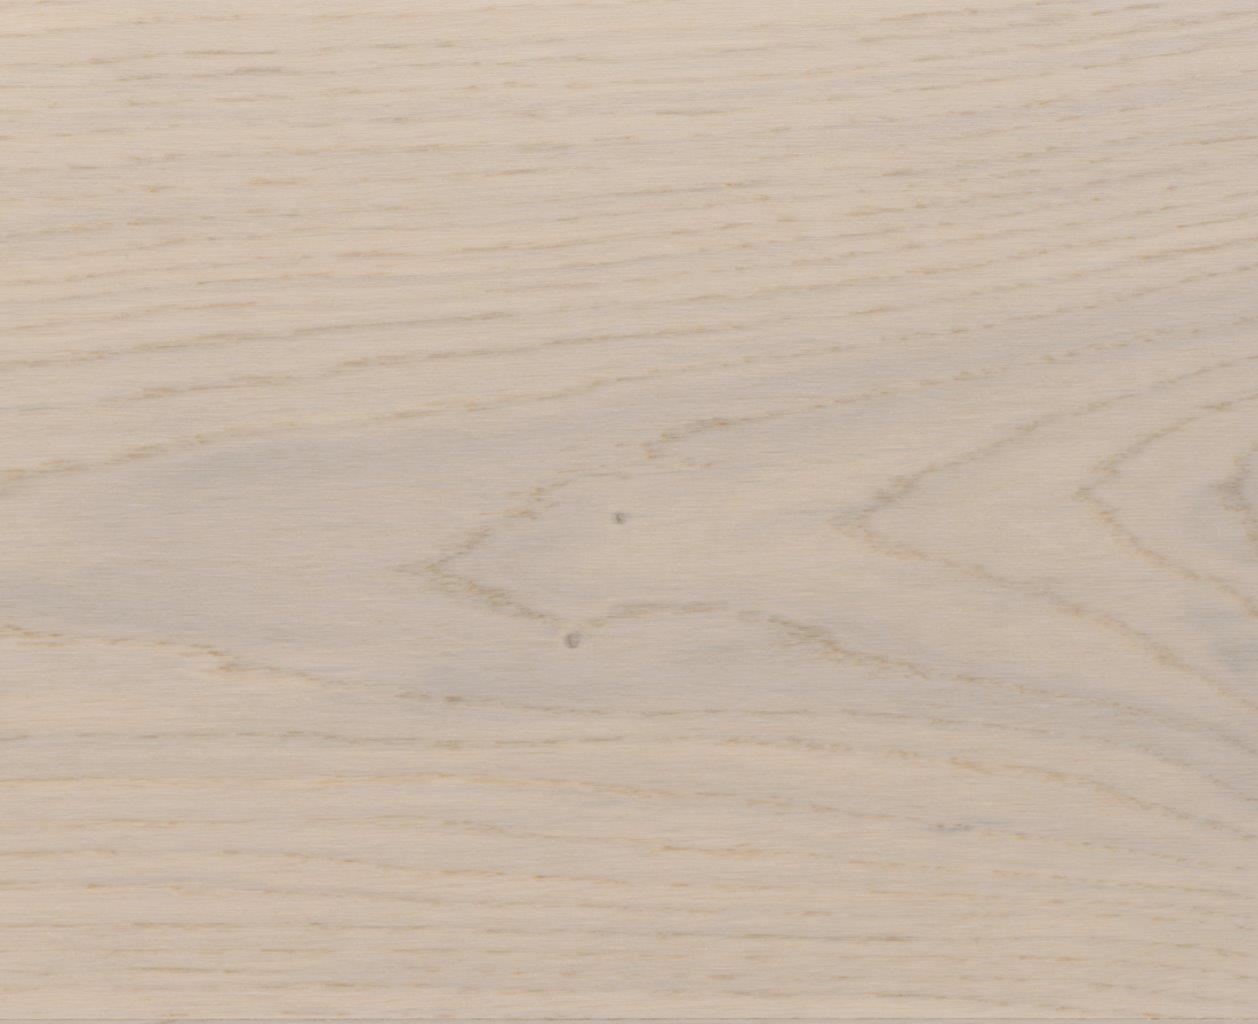 HOLZLOC Holz-Fertigparkett, 1-Stab Eiche natur, pearlwhite lackiert 2200x192x14mm